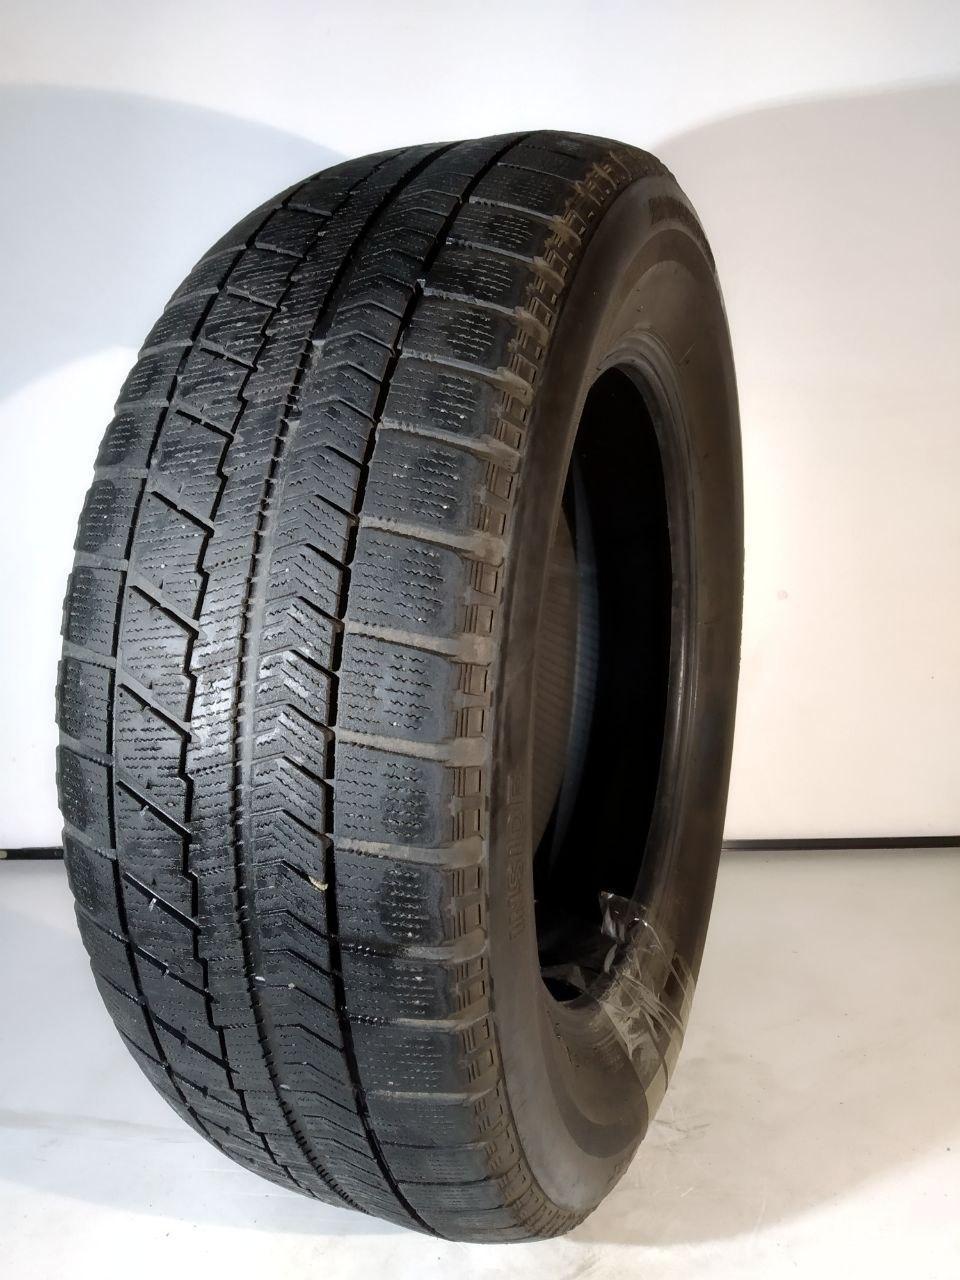 Б/у шины Bridgestone Blizzak VRX 215/60 R16 95S зимние. Япония 2015г 2шт. глубина протектора 4,5